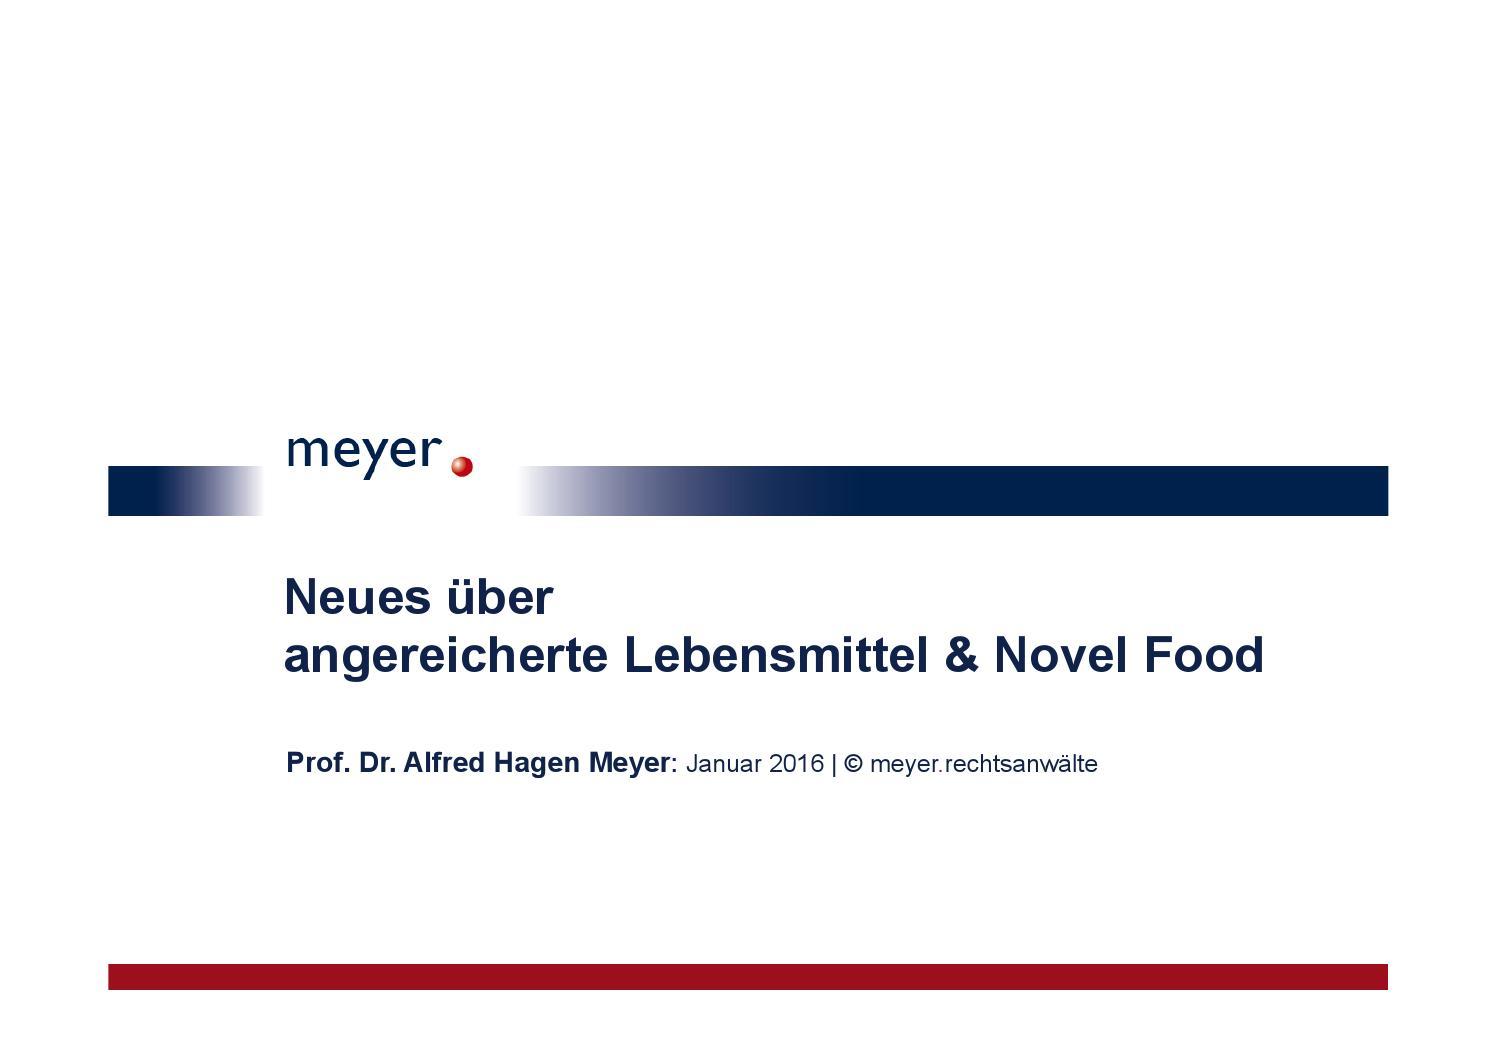 Neues über angereicherte Lebensmittel & Novel Food by meyer ...